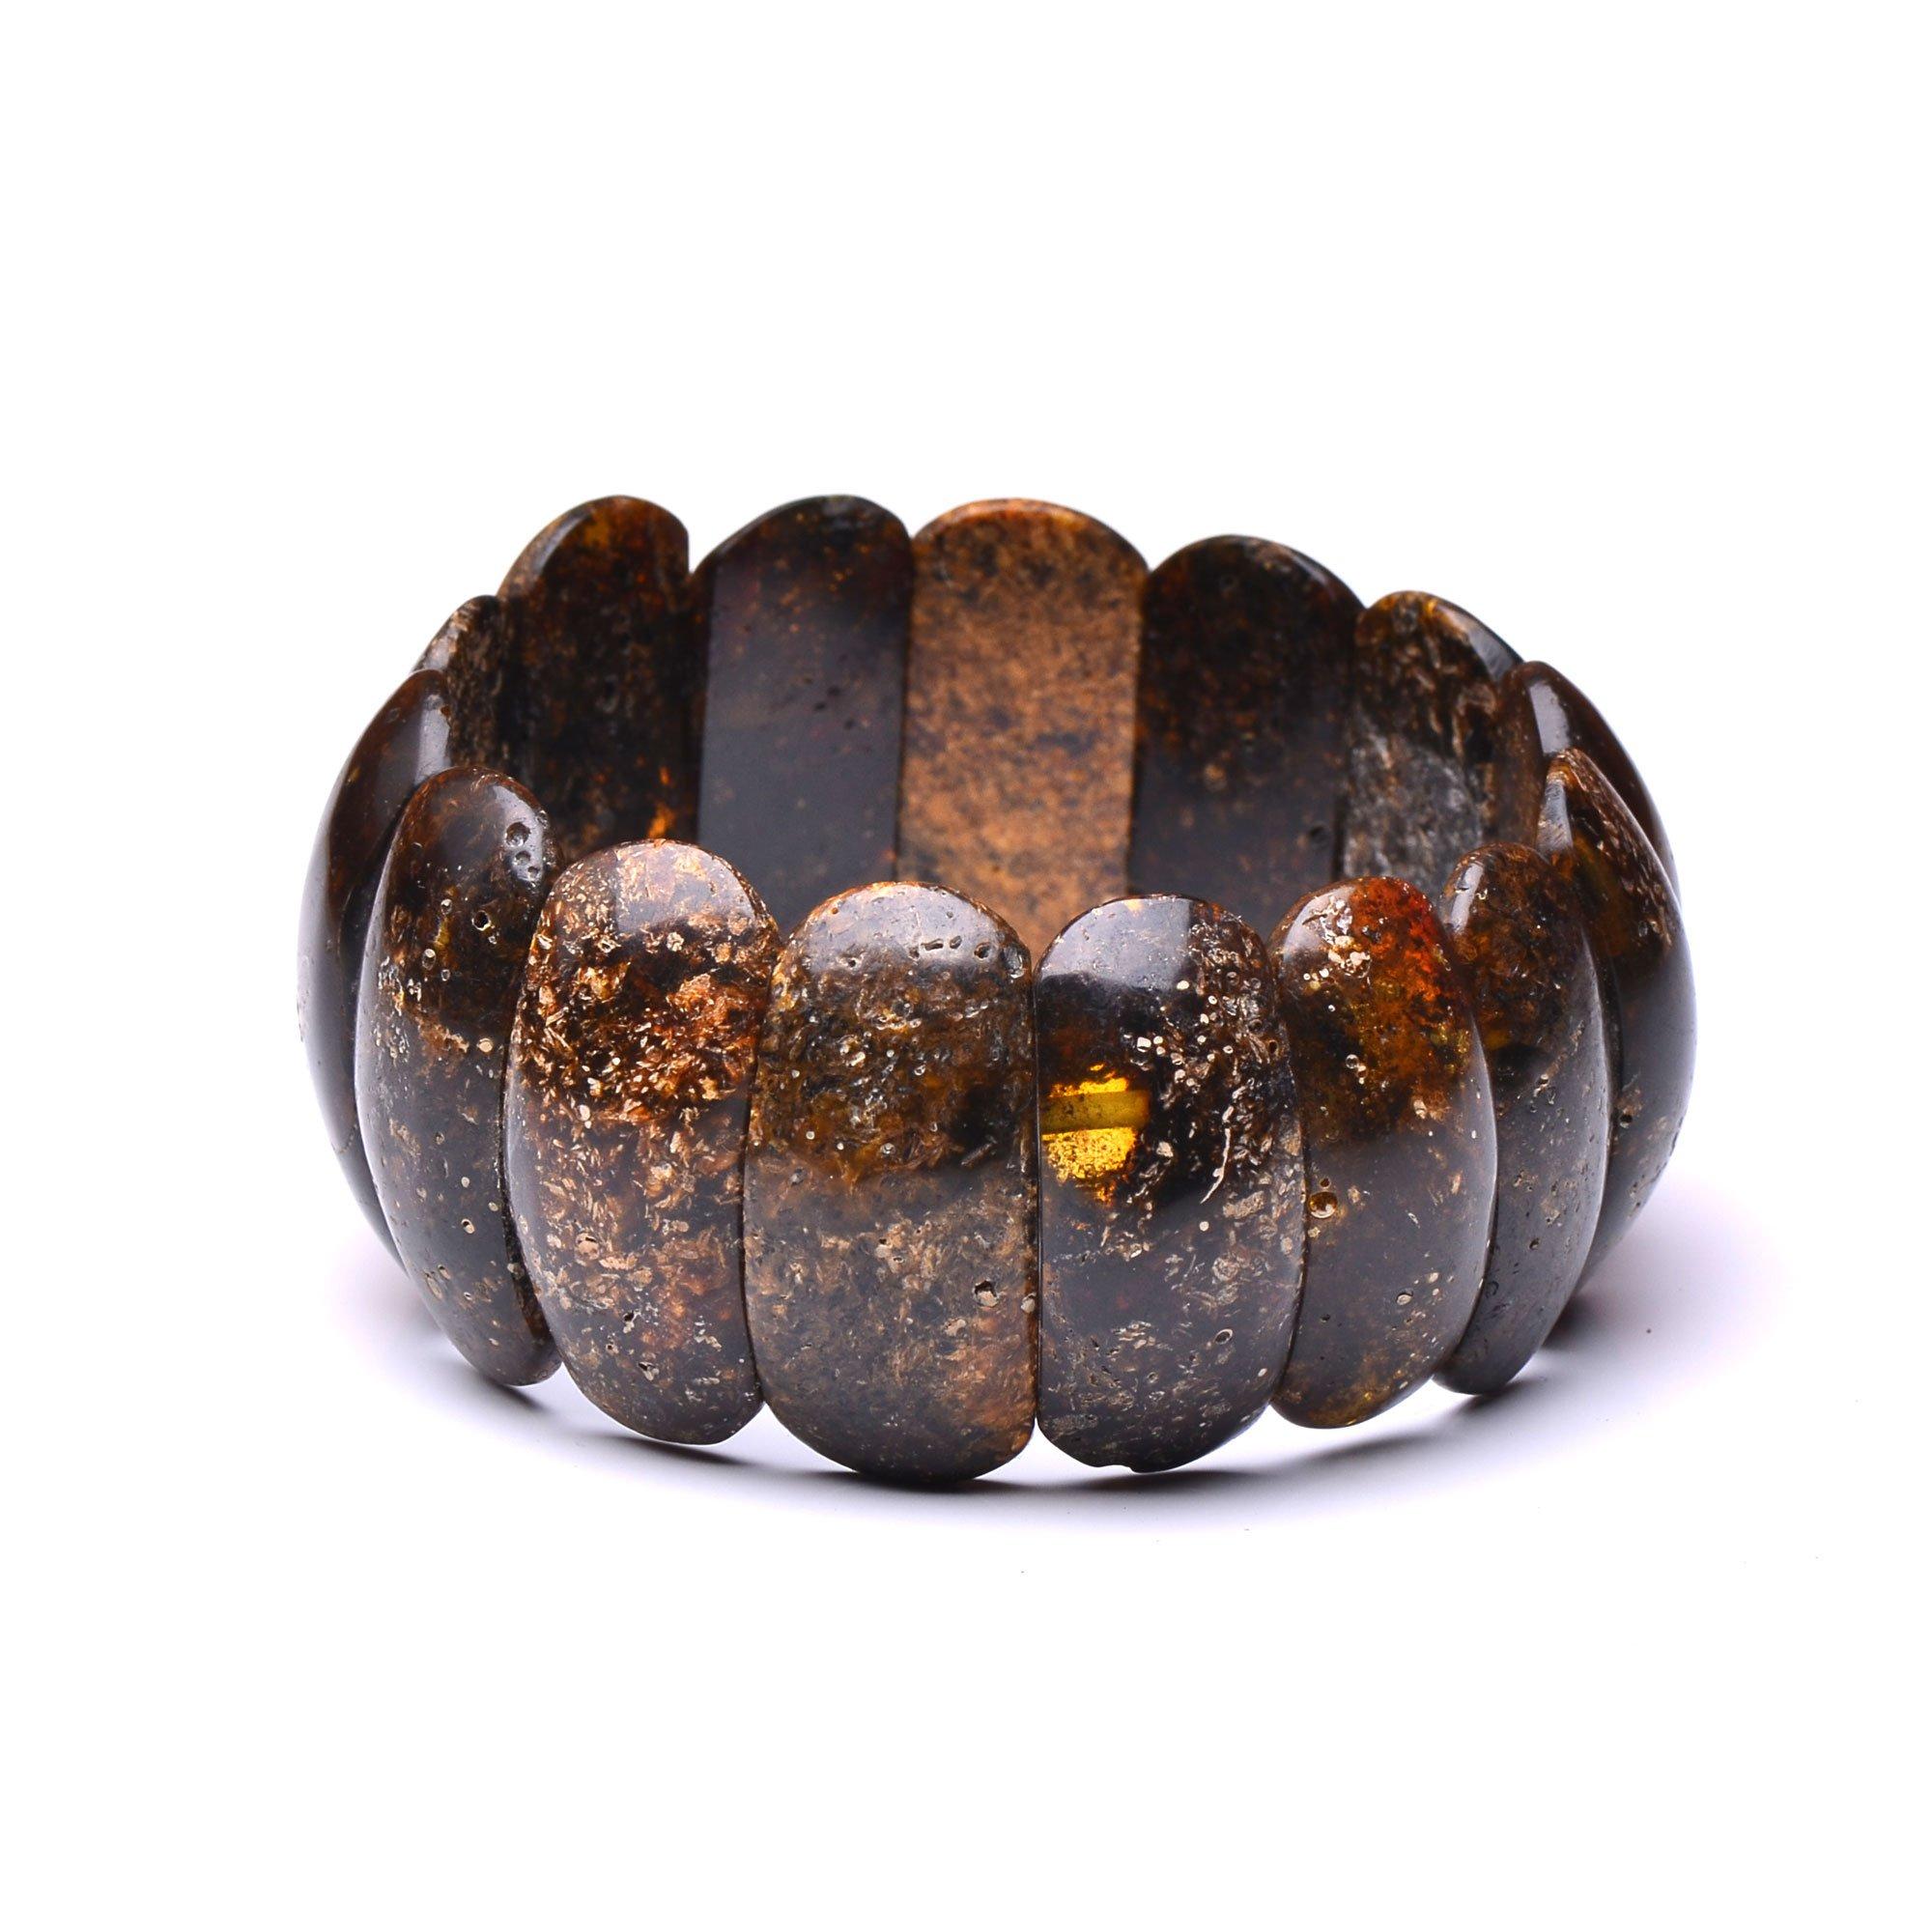 Certified Unique Amber Bracelet - Dark Amber Bracelet - Exclusive Bracelet Made from Amber by Genuine Amber